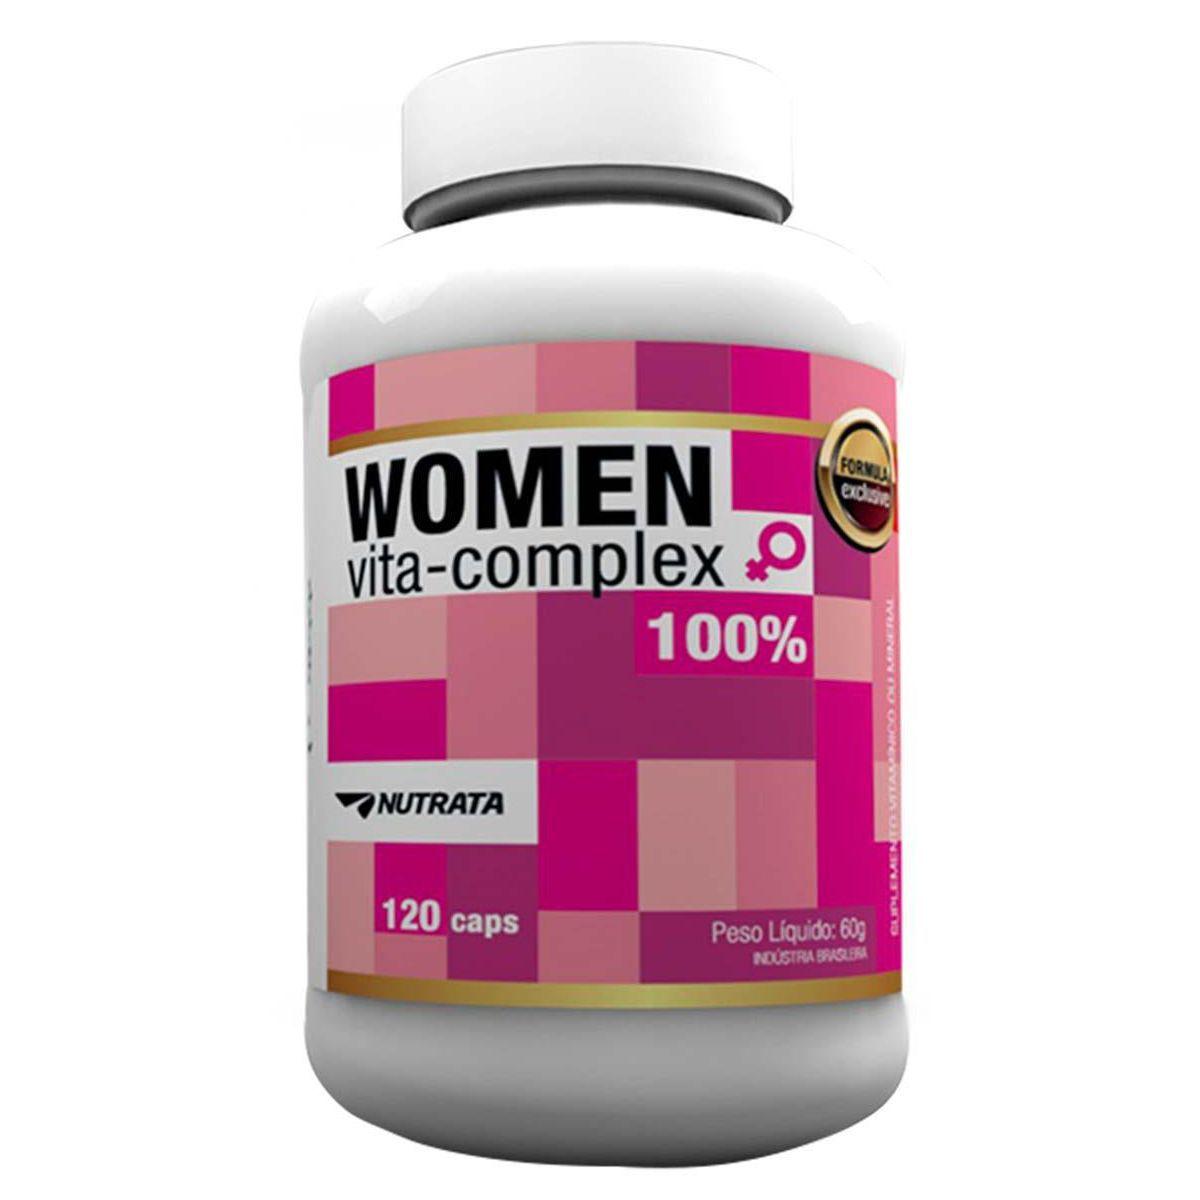 Women Vita - Complex NUTRATA - 120caps